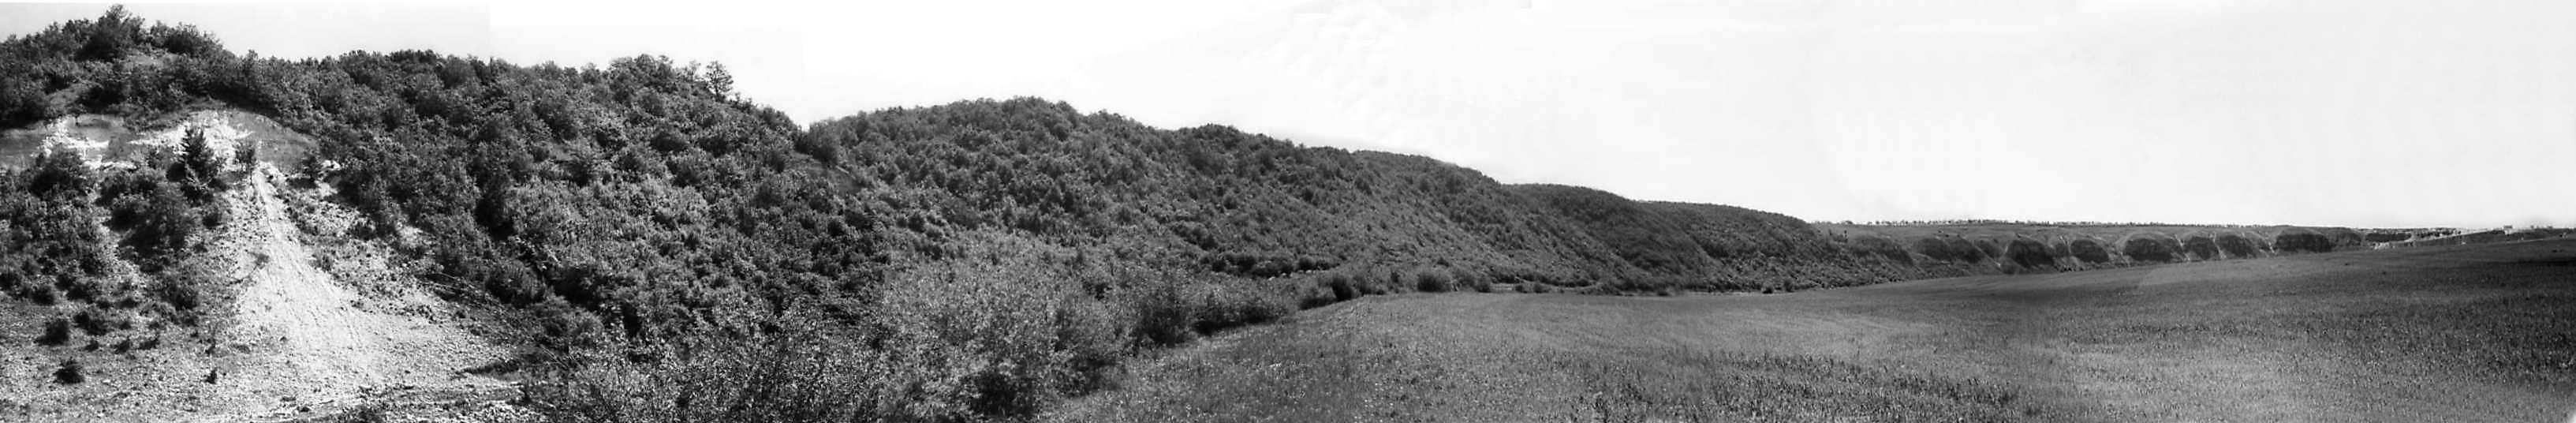 1978 р. Панорама луки Збруча